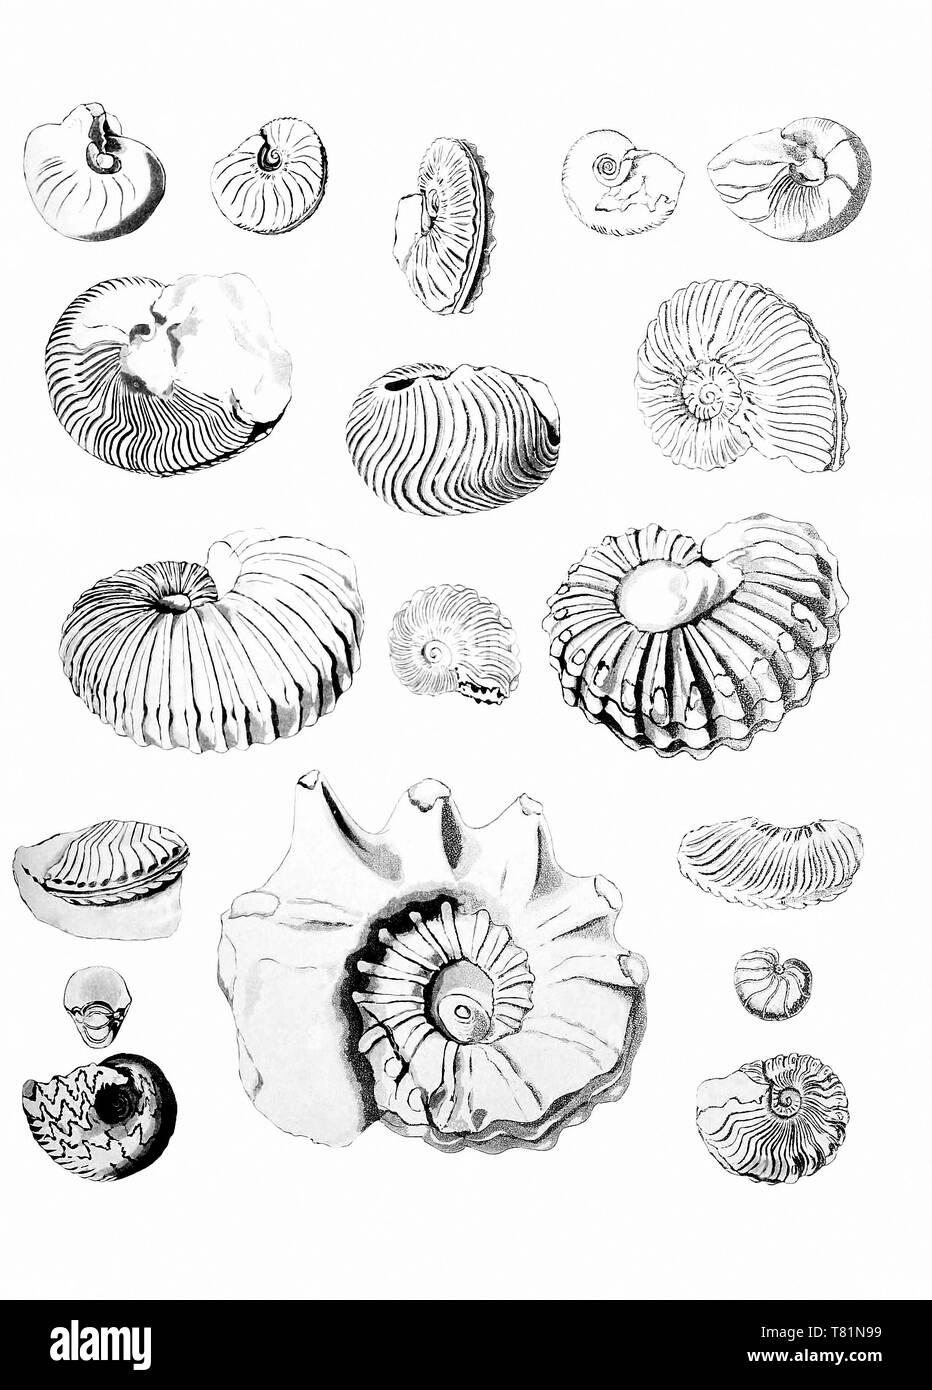 Cretaceous Ammonites - Stock Image